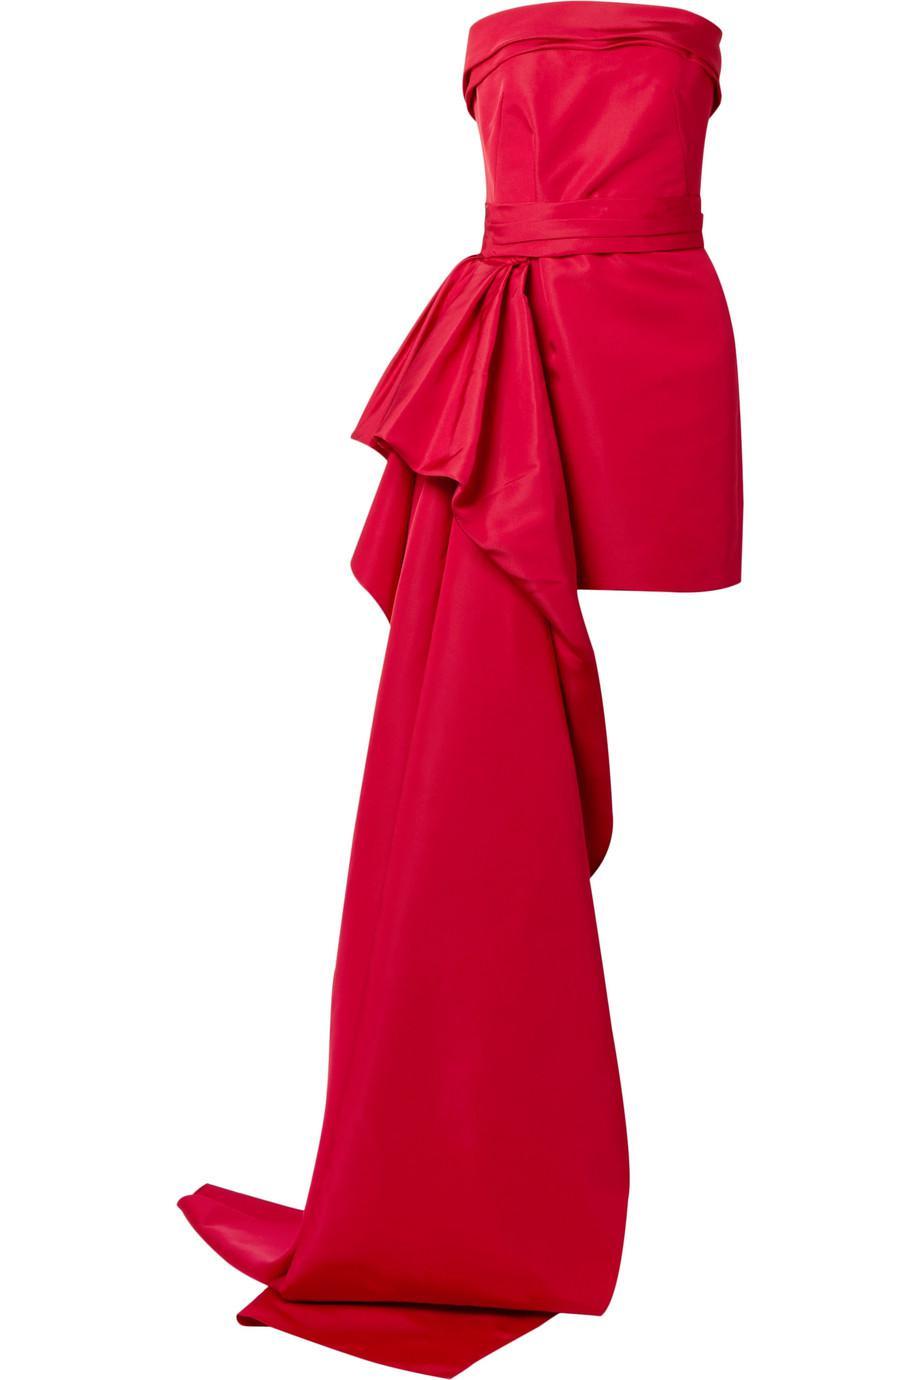 Lyst - Reem Acra Silk-faille Mini Dress in Red